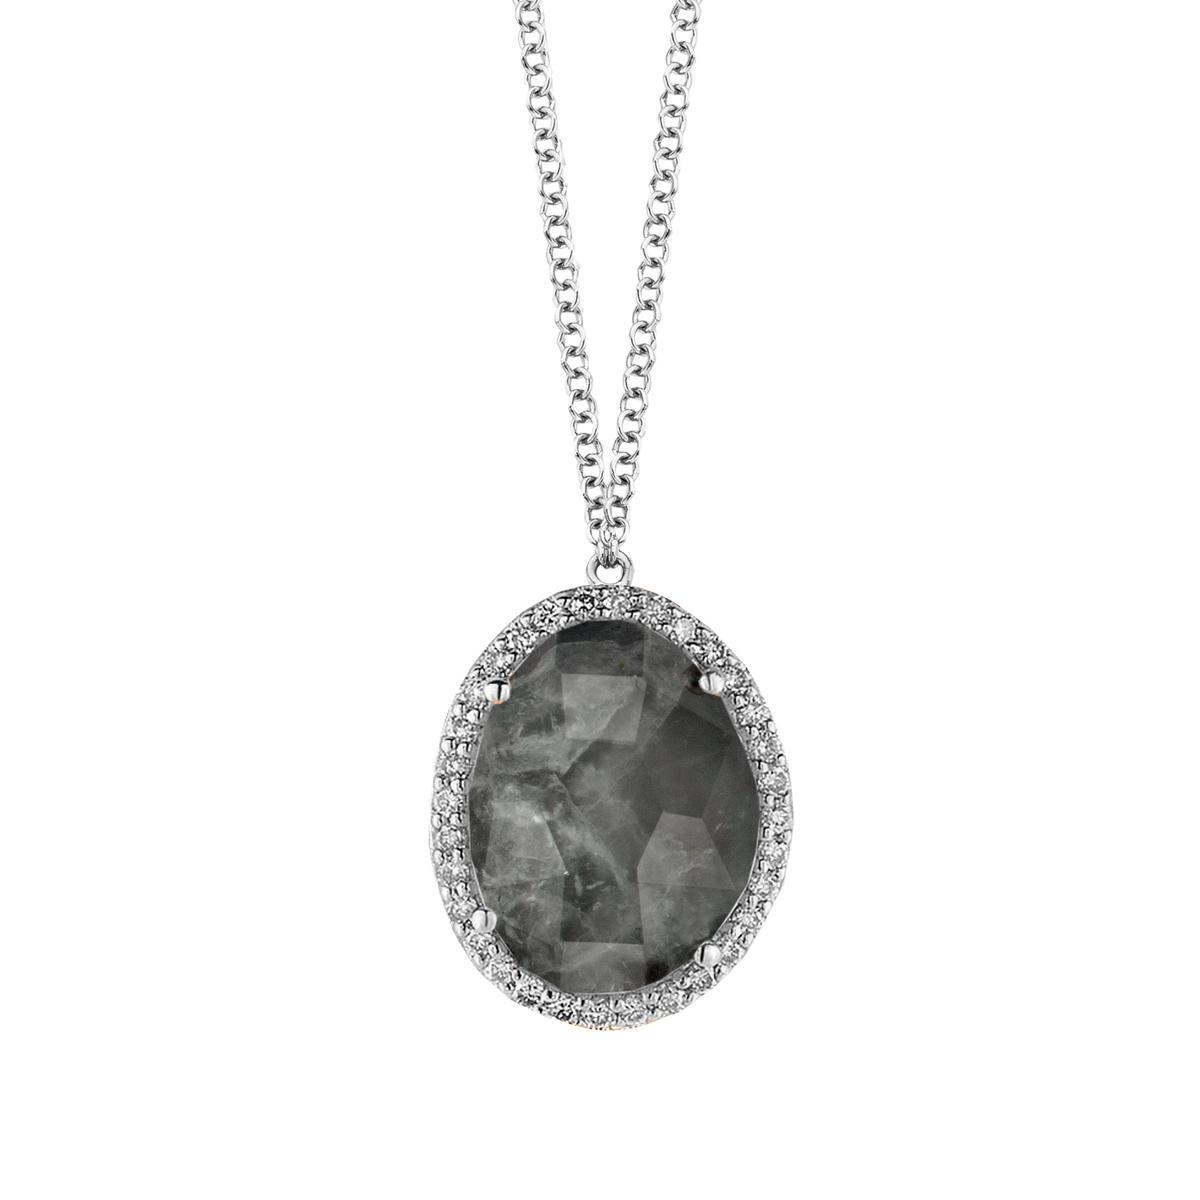 stromboli necklace in white gold